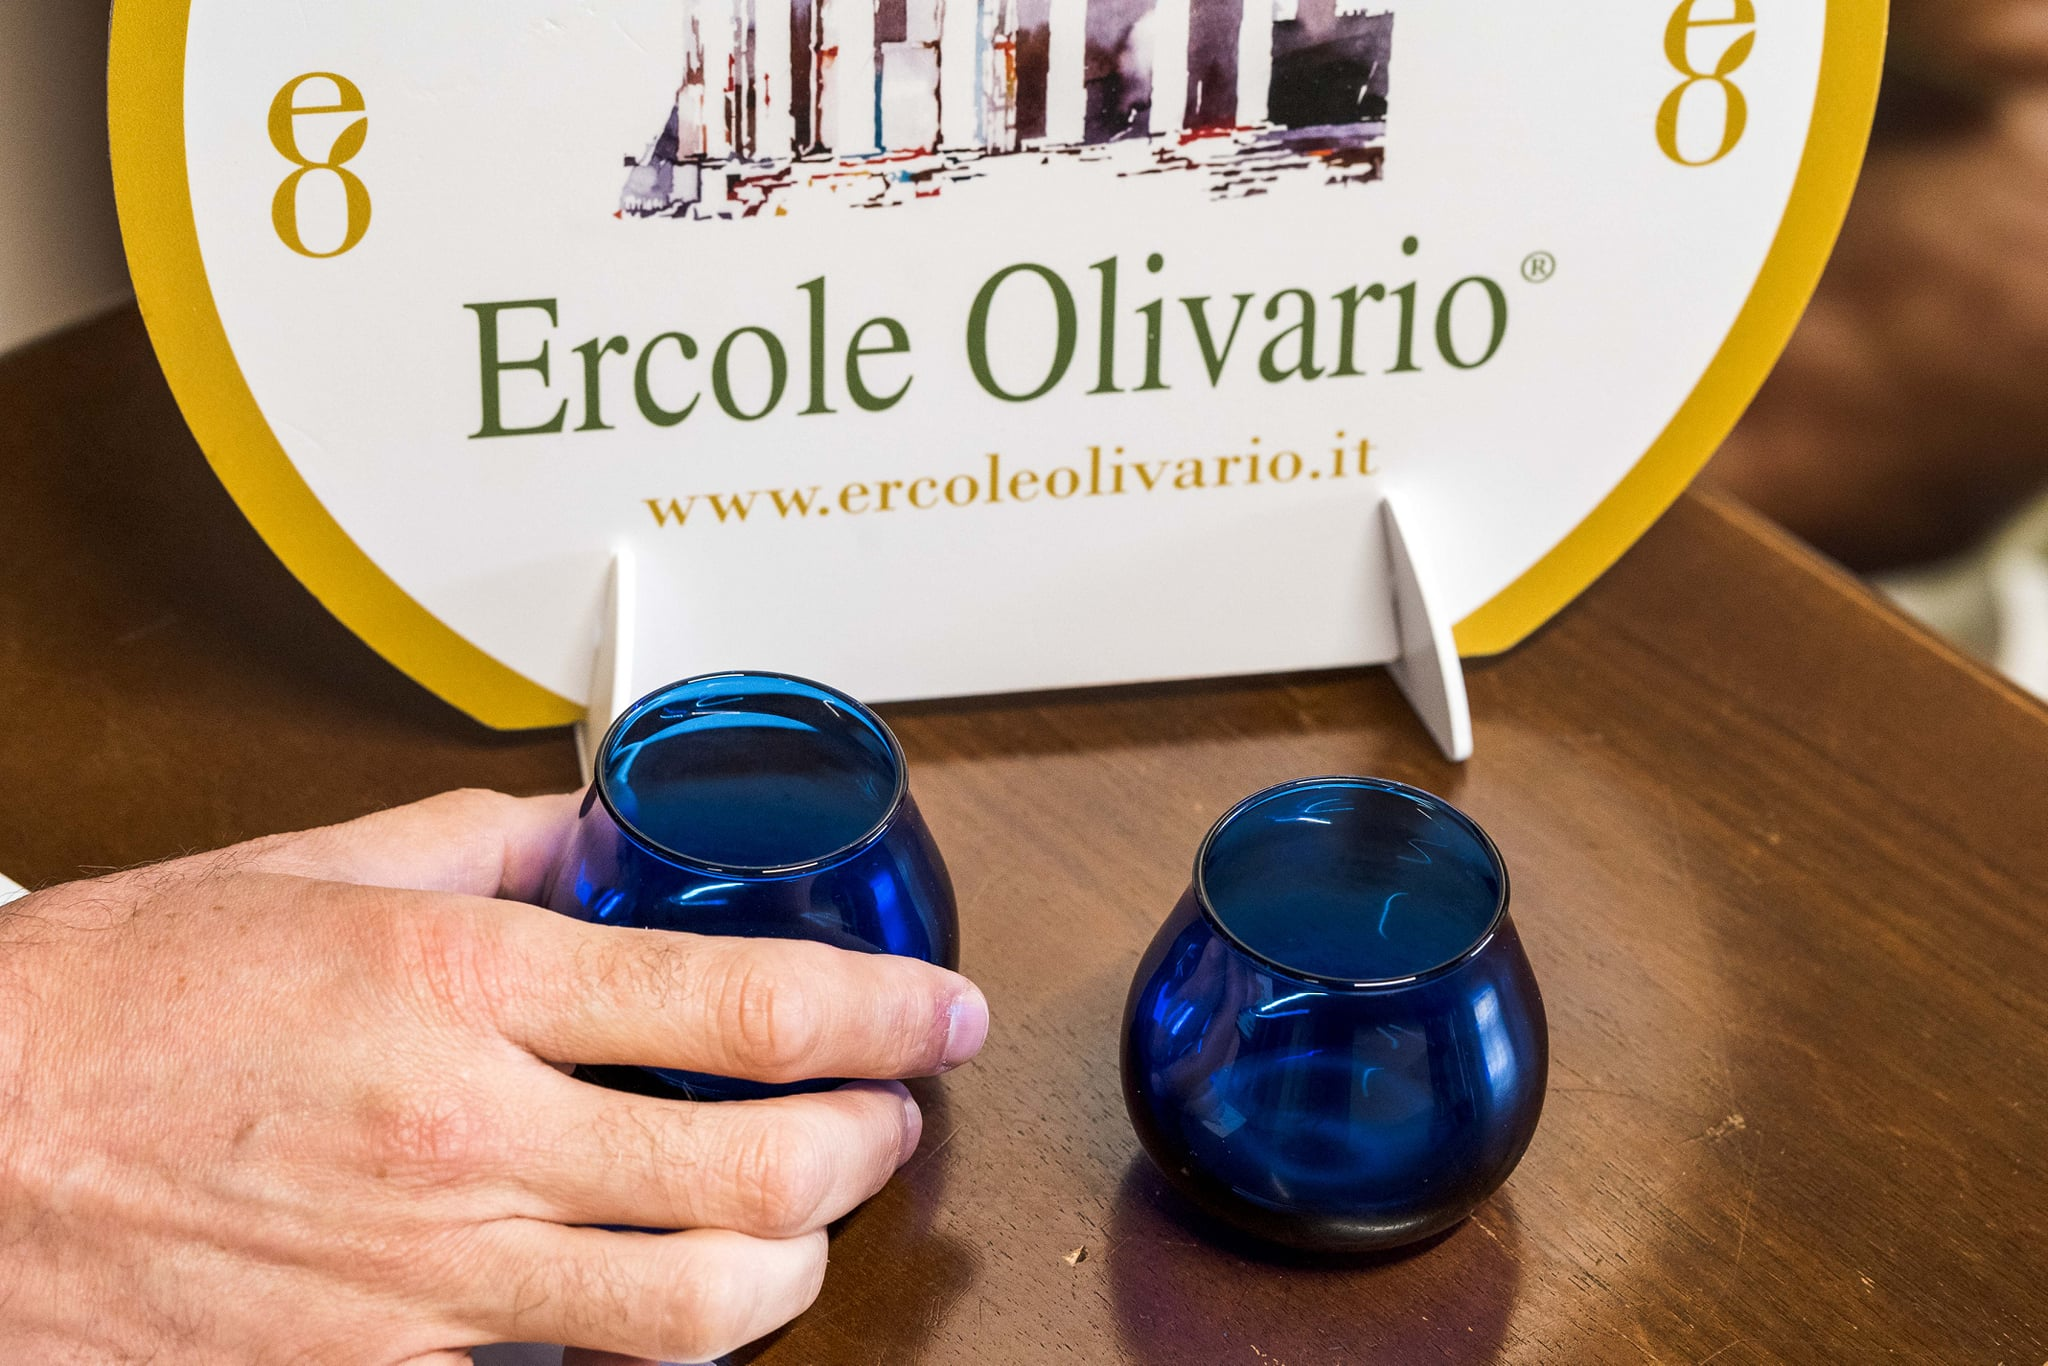 ercole olivario 2021